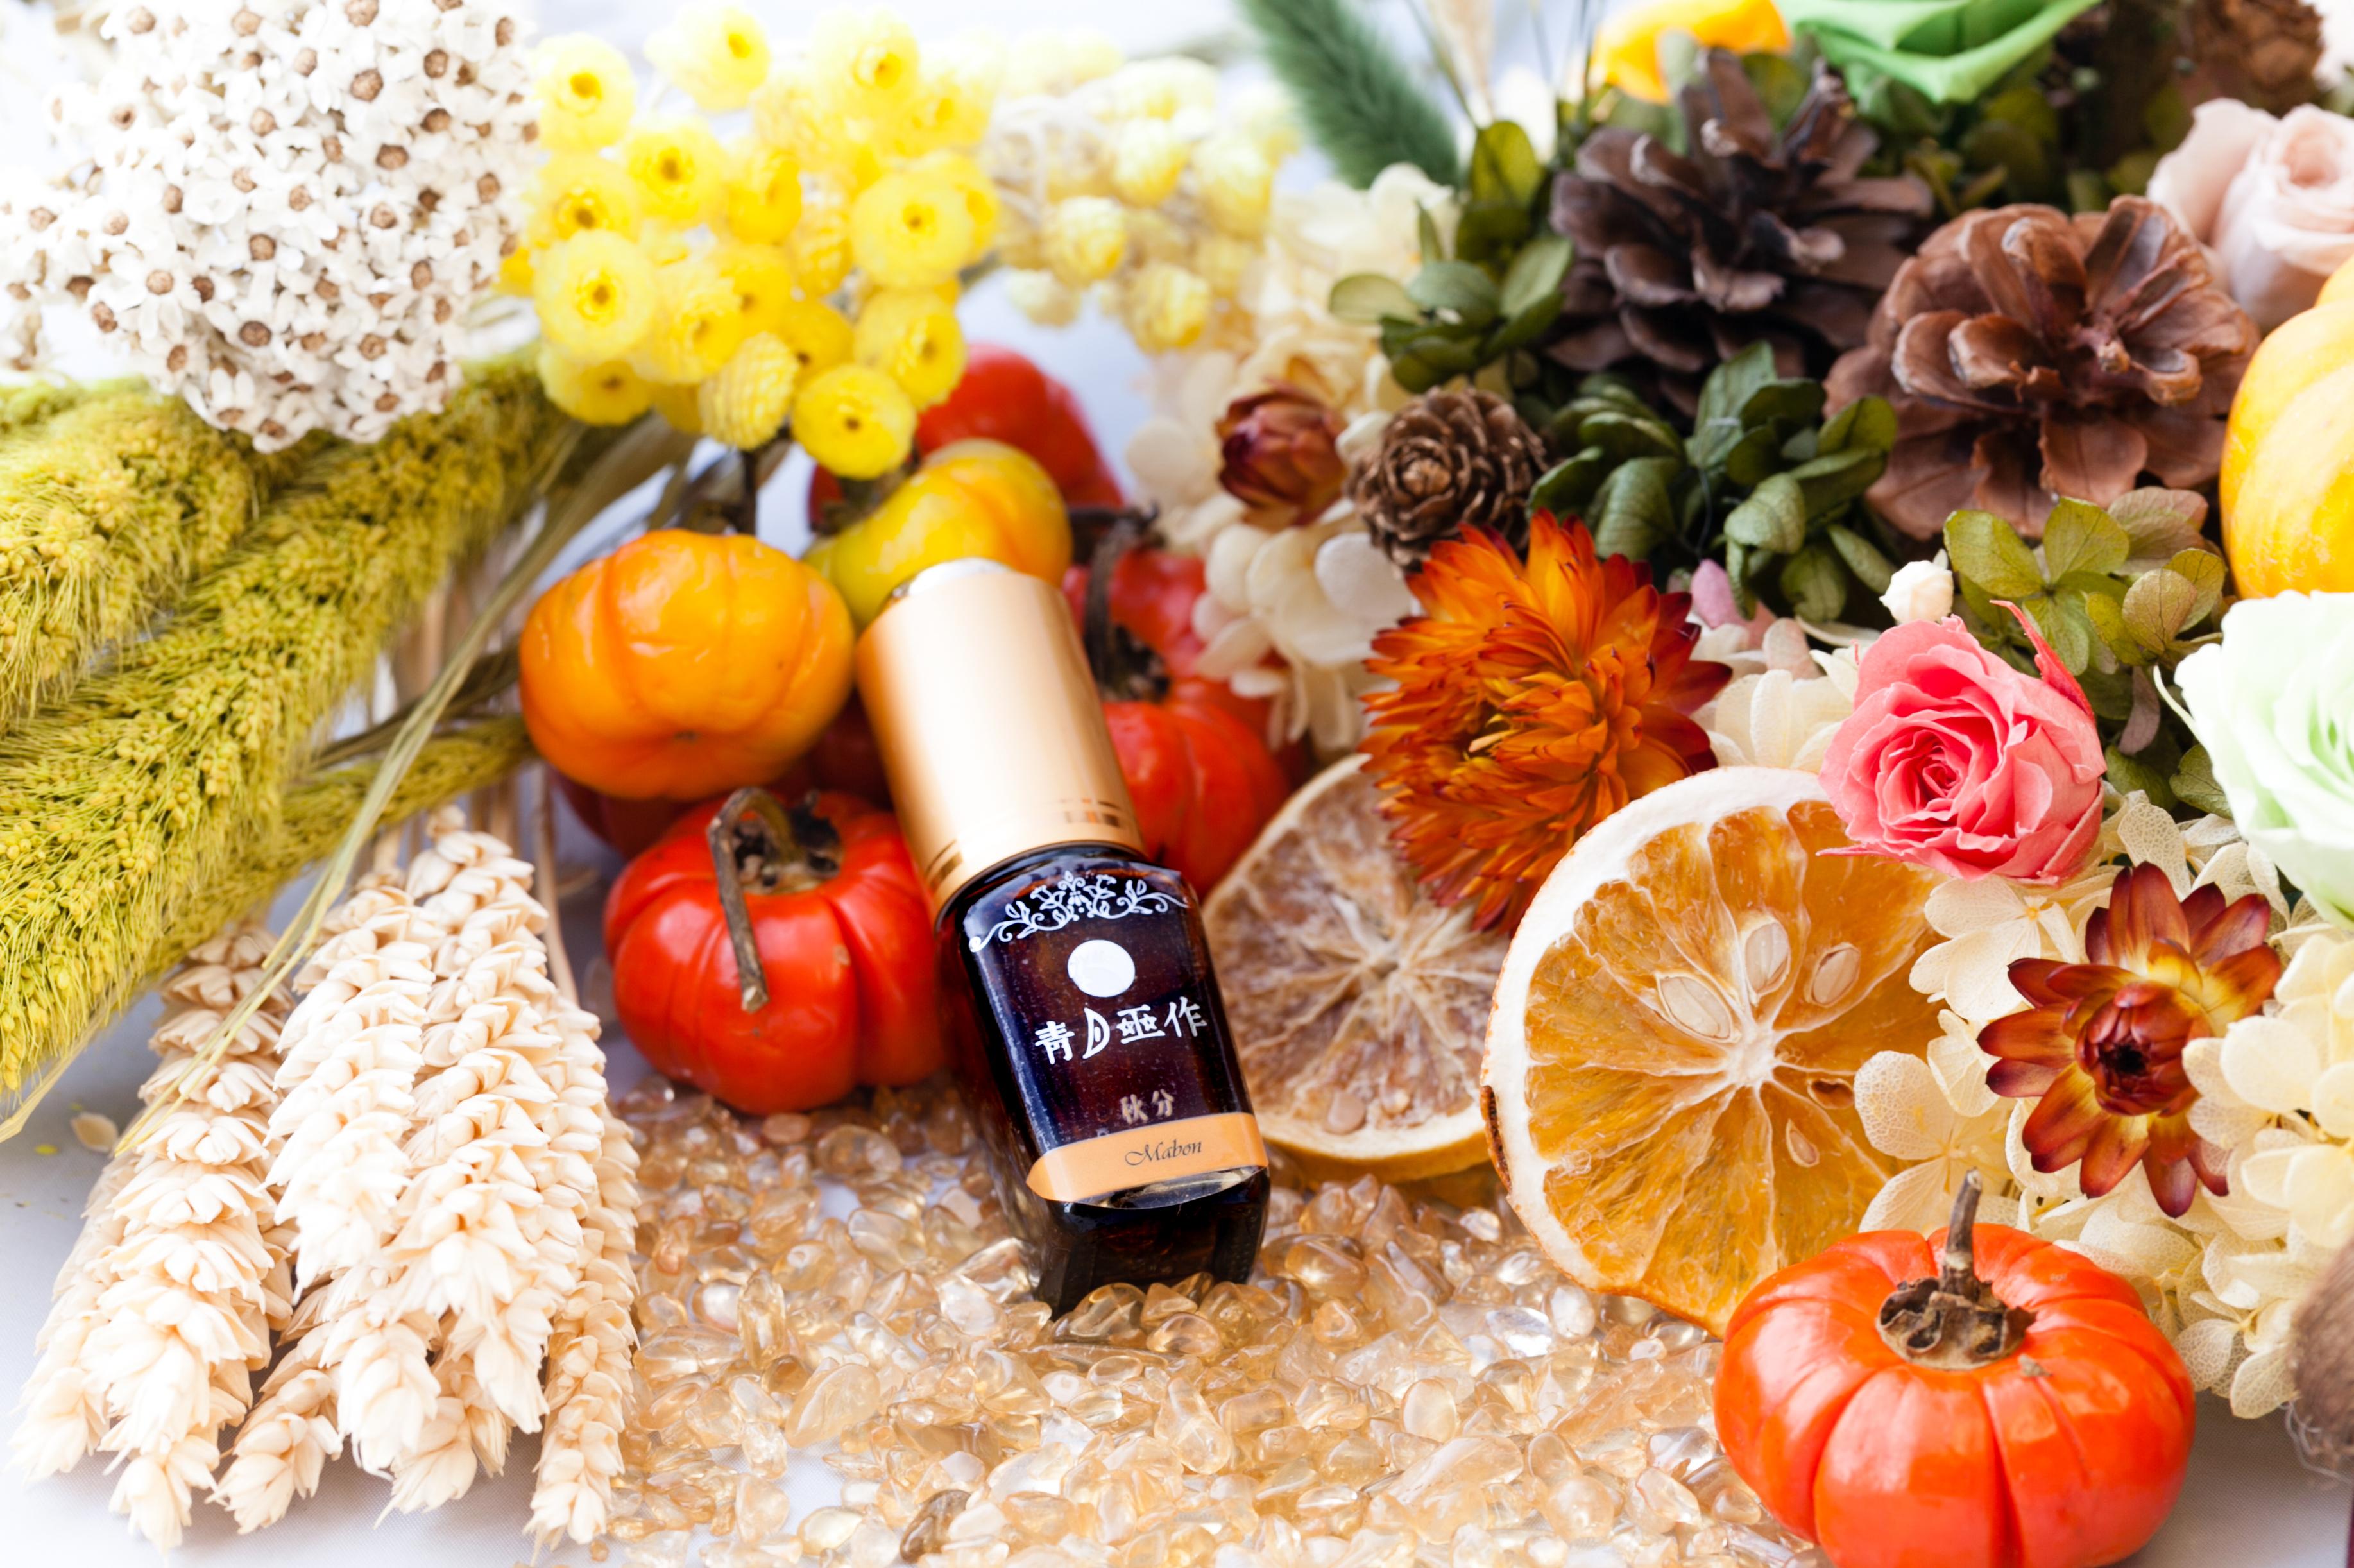 【能量補充】2016 秋分季節魔法油 Seasonal Magic Oil-Mabon